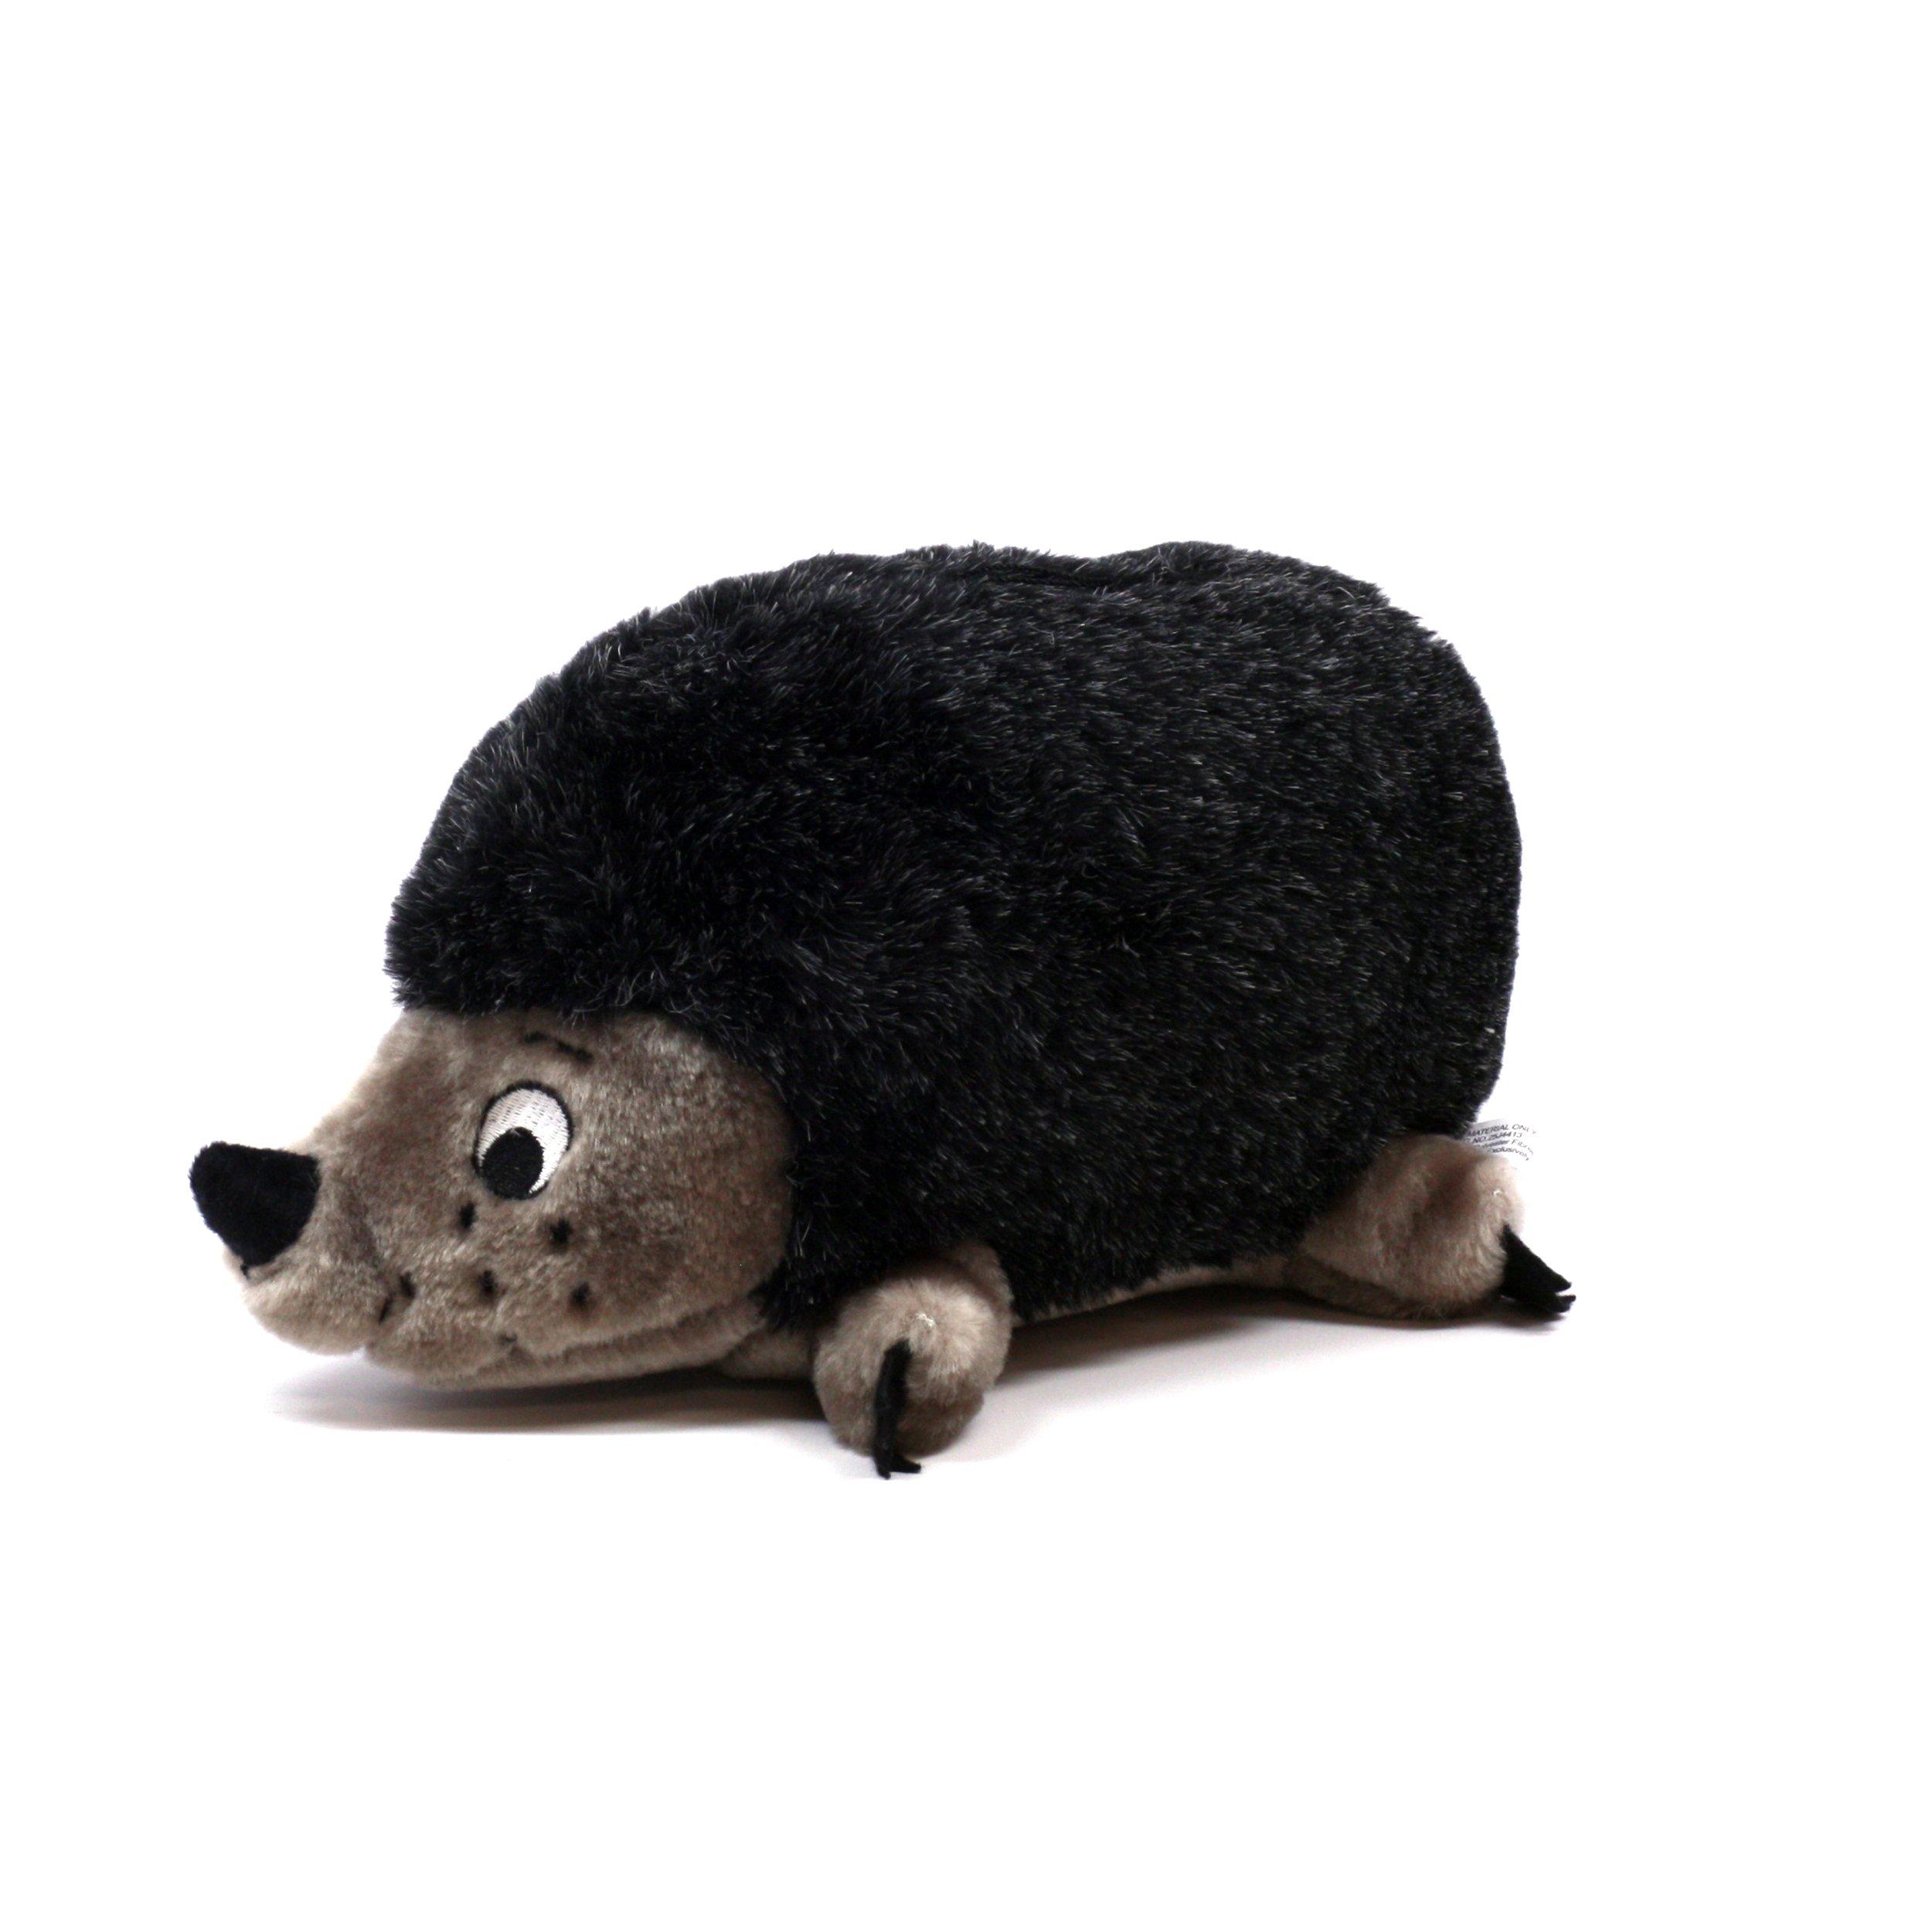 Outward Hound Kyjen  PP01529 Hedgehog Dog Toys Grunt Toy, Medium, Grey by Plush Puppies